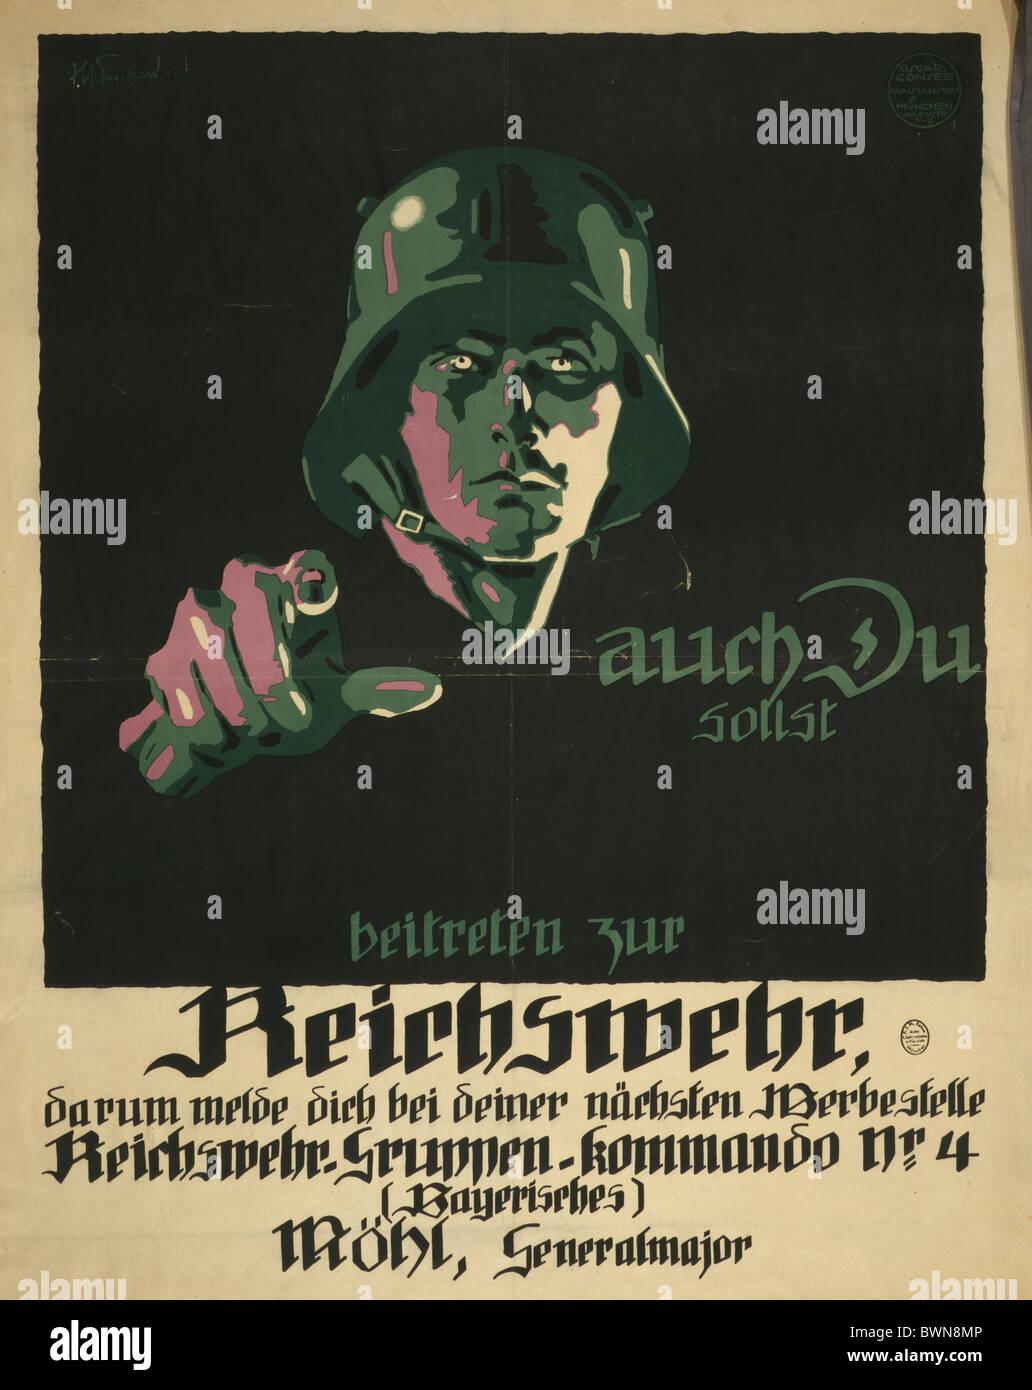 Reichswehr 1919 Weimar Republic Mohl General major Propaganda poster recruitment recruiting advertising mili - Stock Image